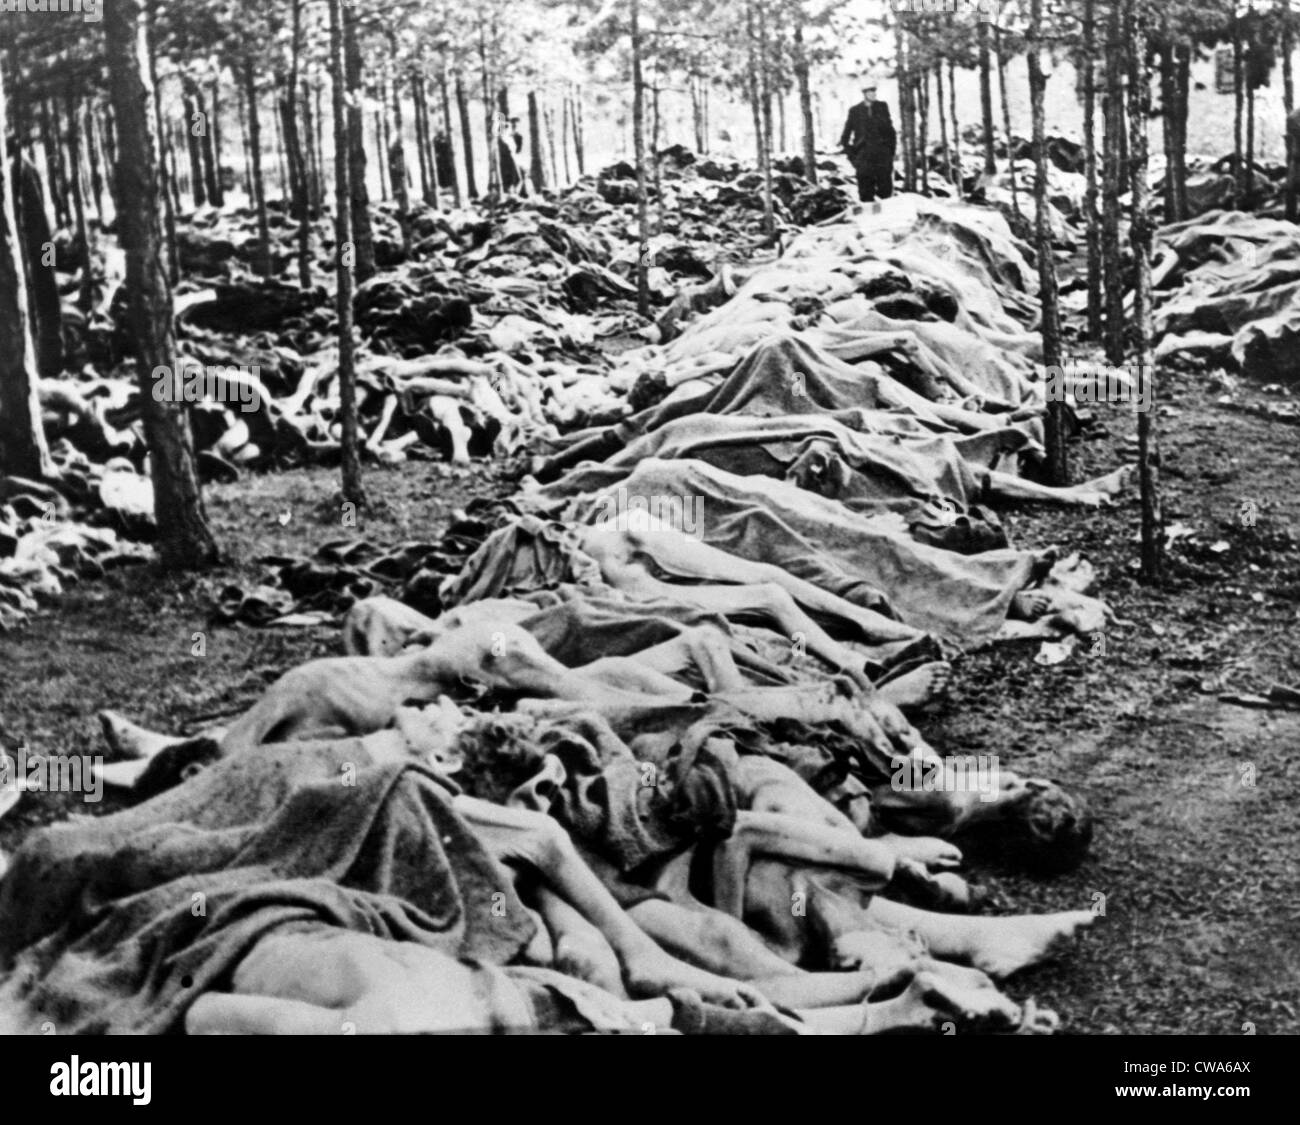 Bergen Belsen Concentration Camp Conditions